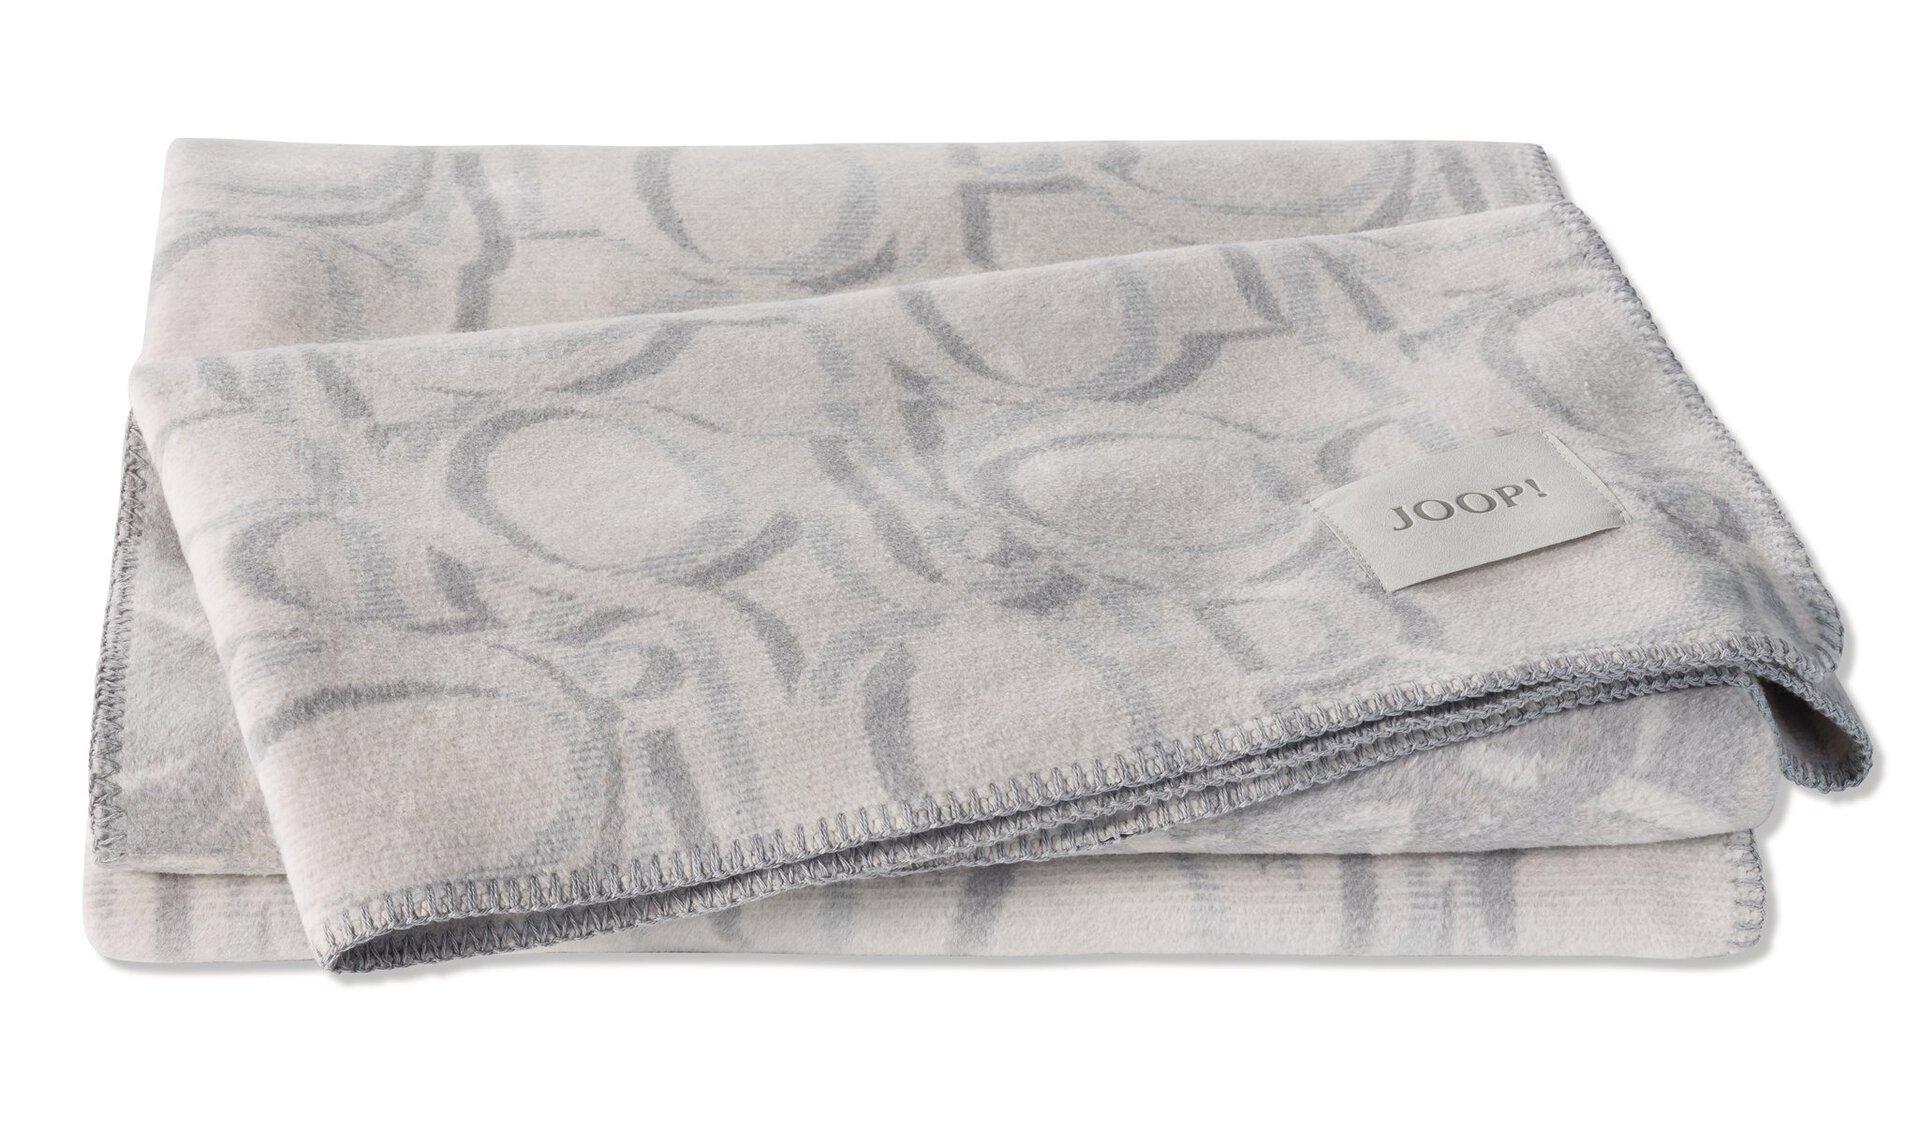 Wohndecke ORNAMENT Joop! Textil beige 150 x 200 cm